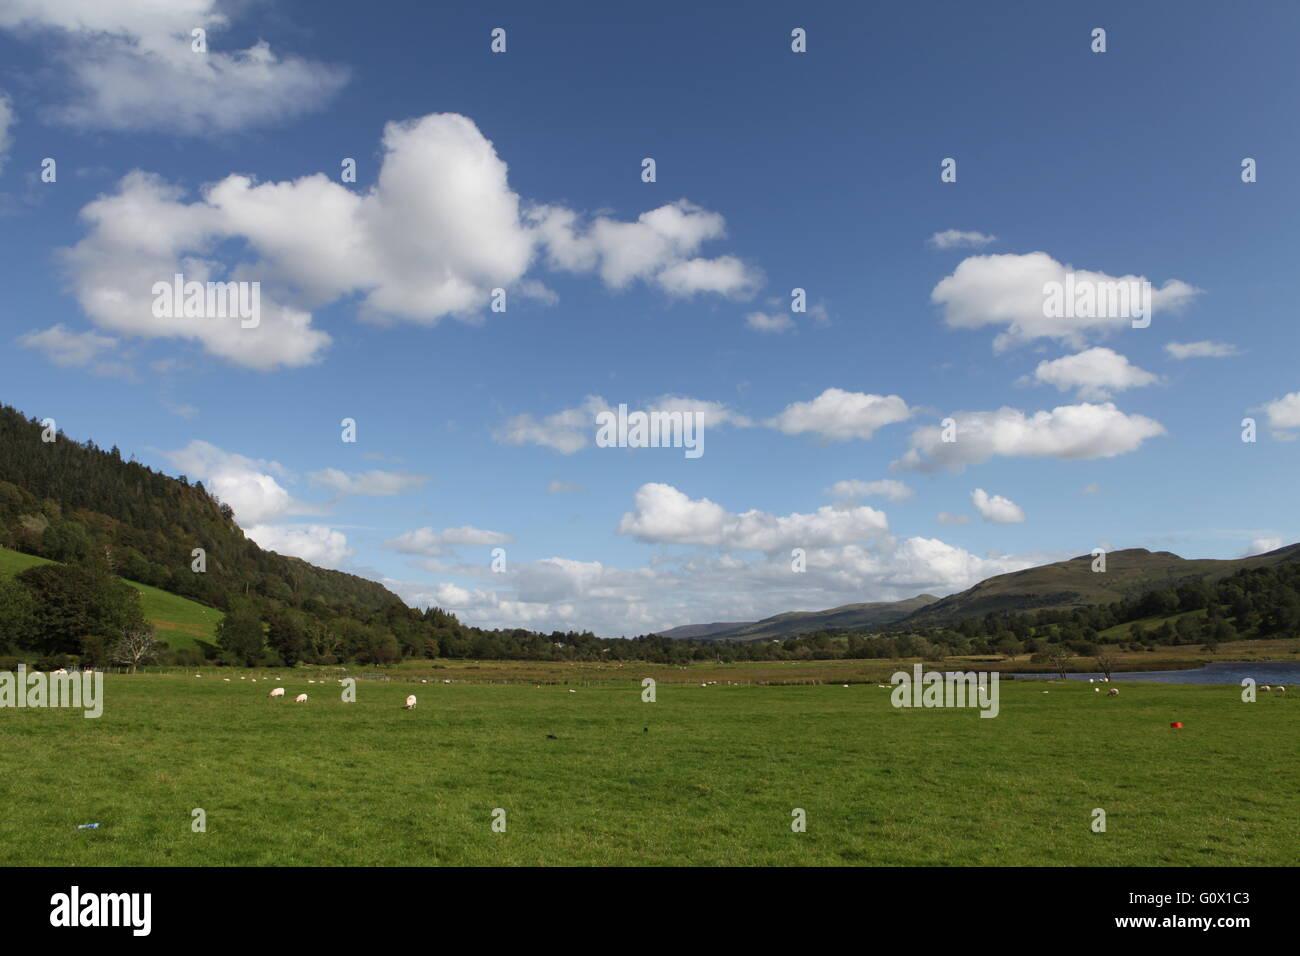 Glencar Valley, County Leitrim, Connacht, Ireland, Europe - Stock Image